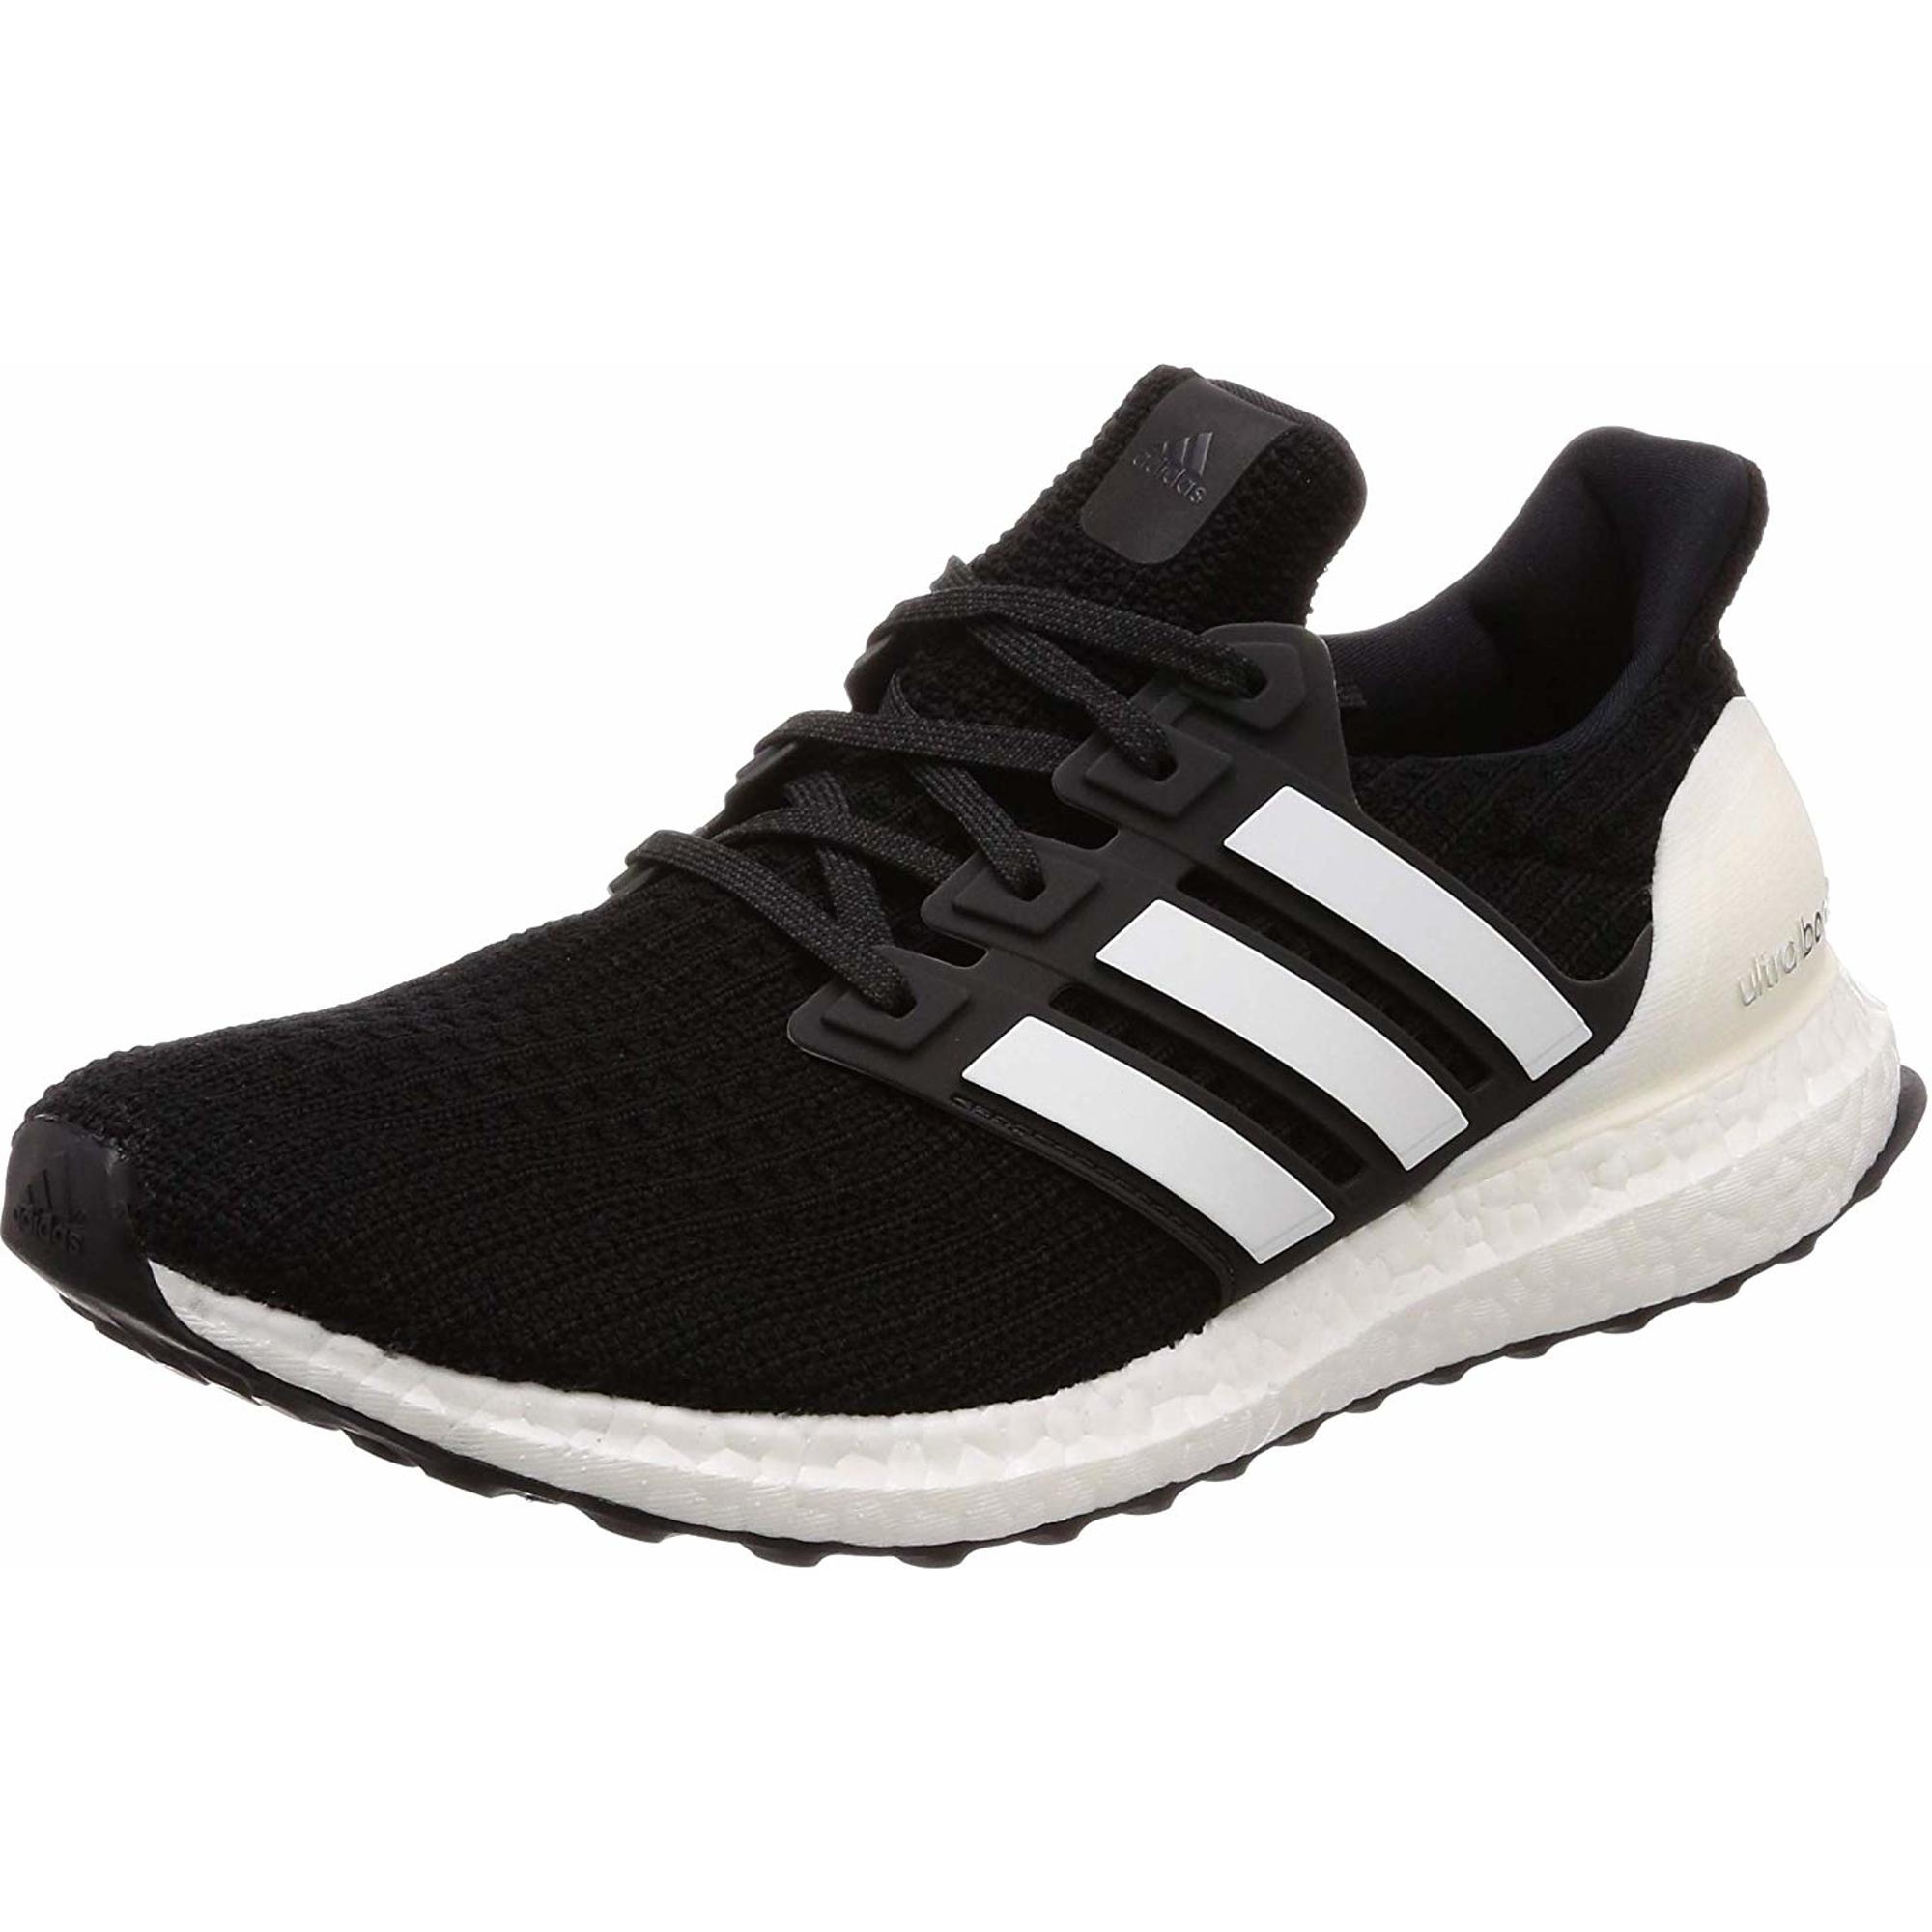 adidas ultra boost noir et blanc